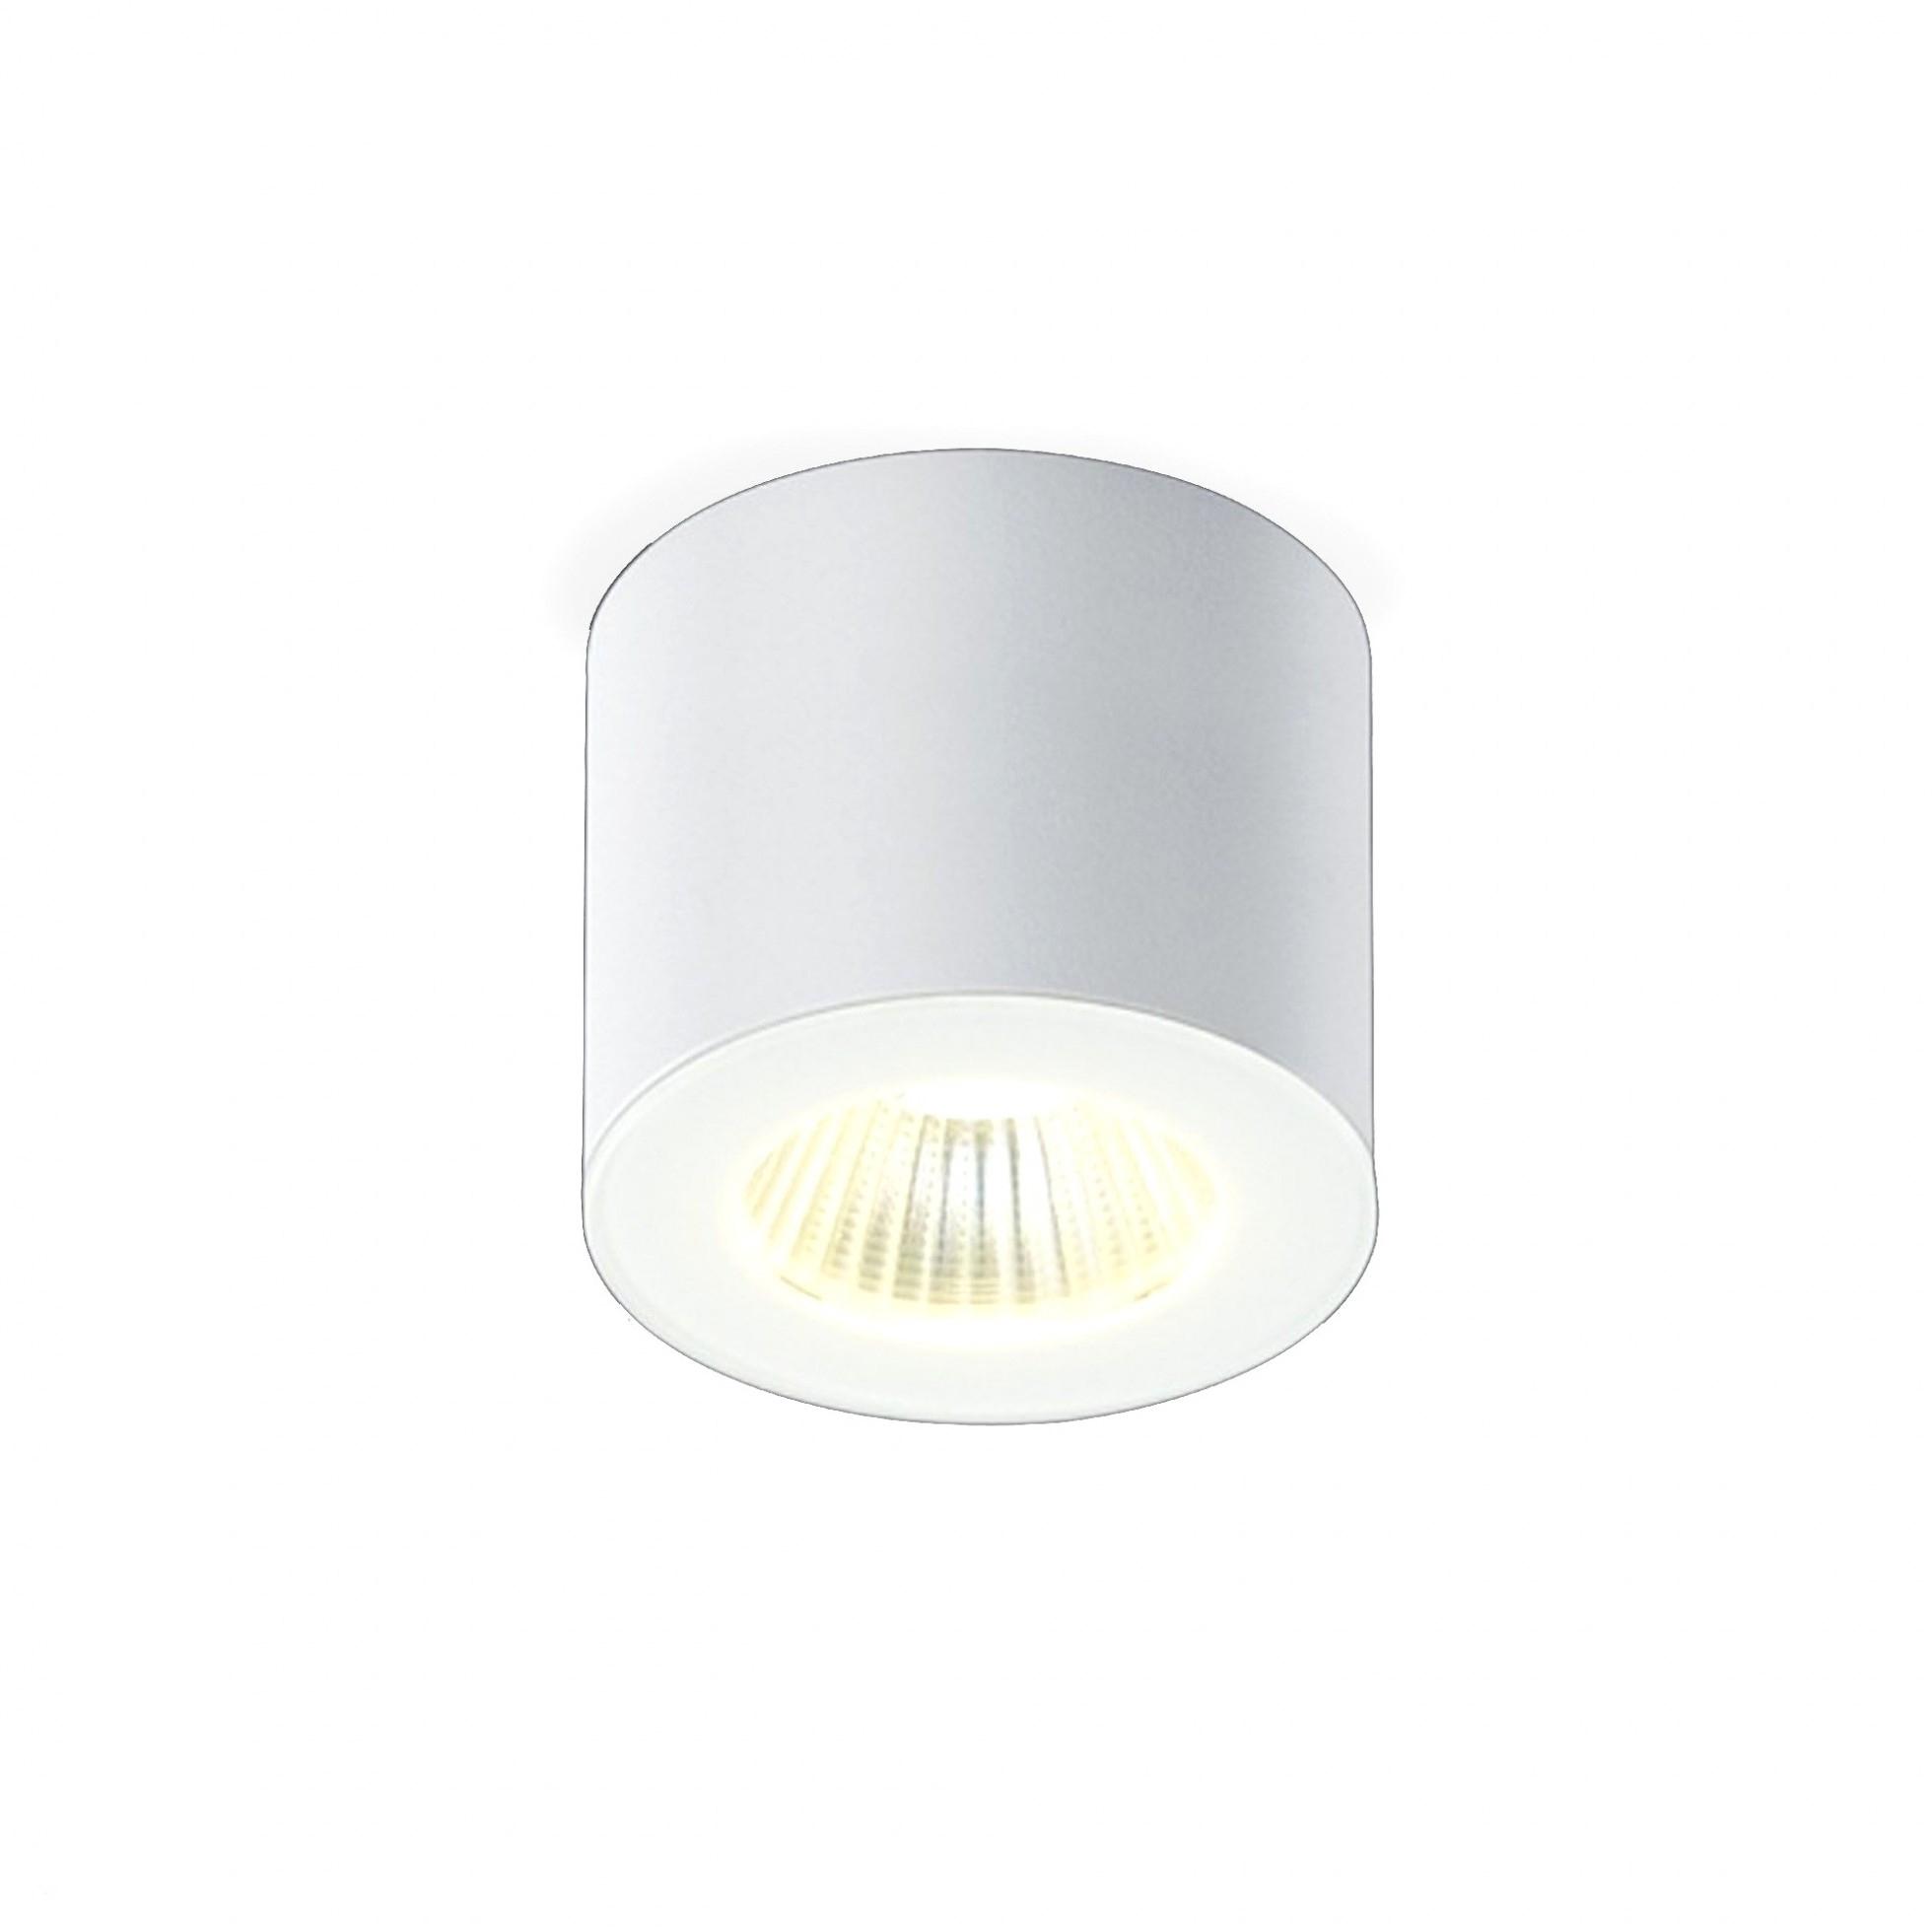 outdoor lights fixtures inspirational led lights for home interior new lamps lamp art lamp art 0d